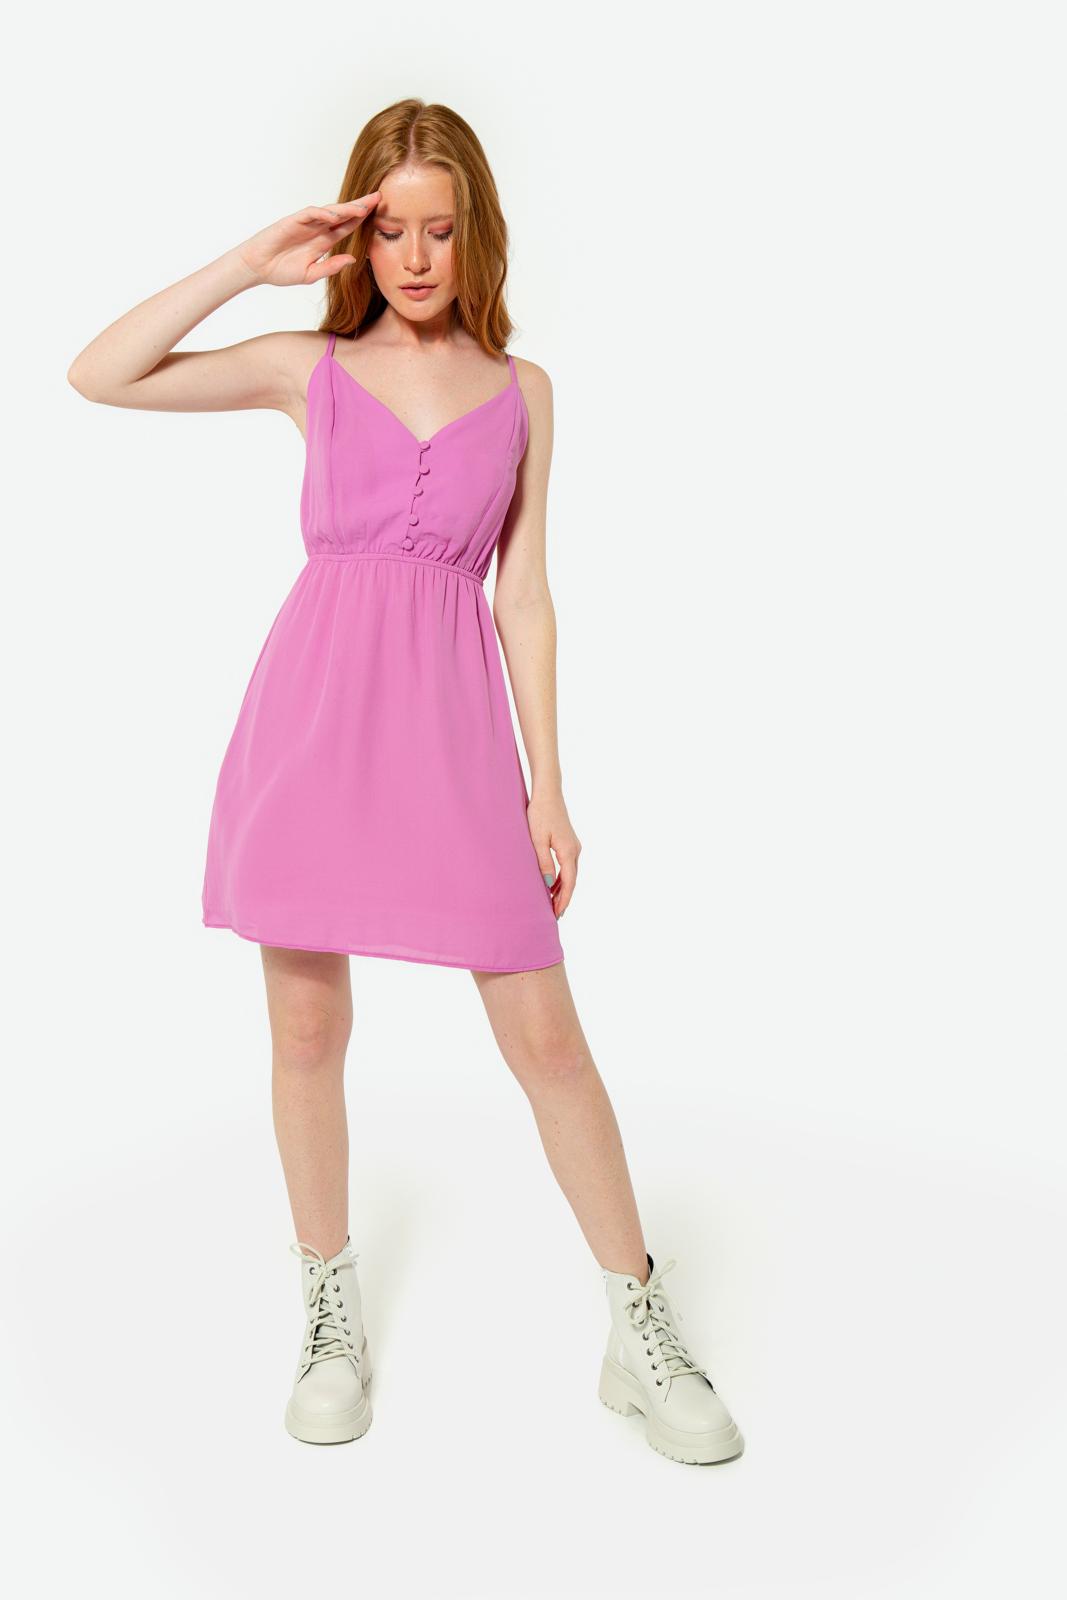 Vestido Serinah Curto Violeta